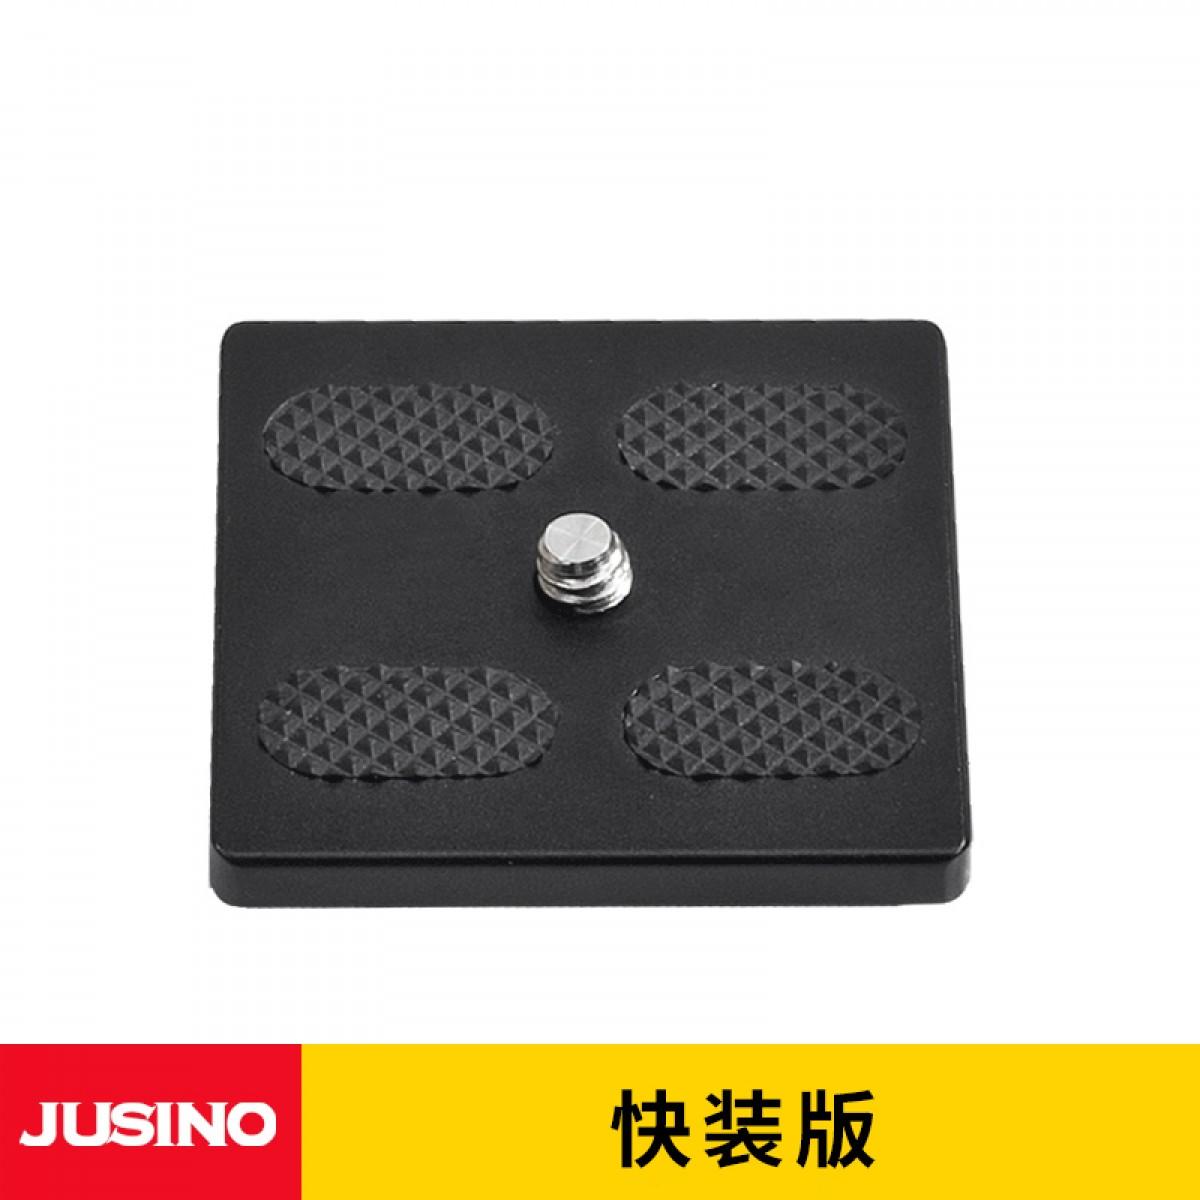 JUSINO/佳鑫悦 三脚架通用云台快装板云台配件 BS-18 BT-02 BT-60